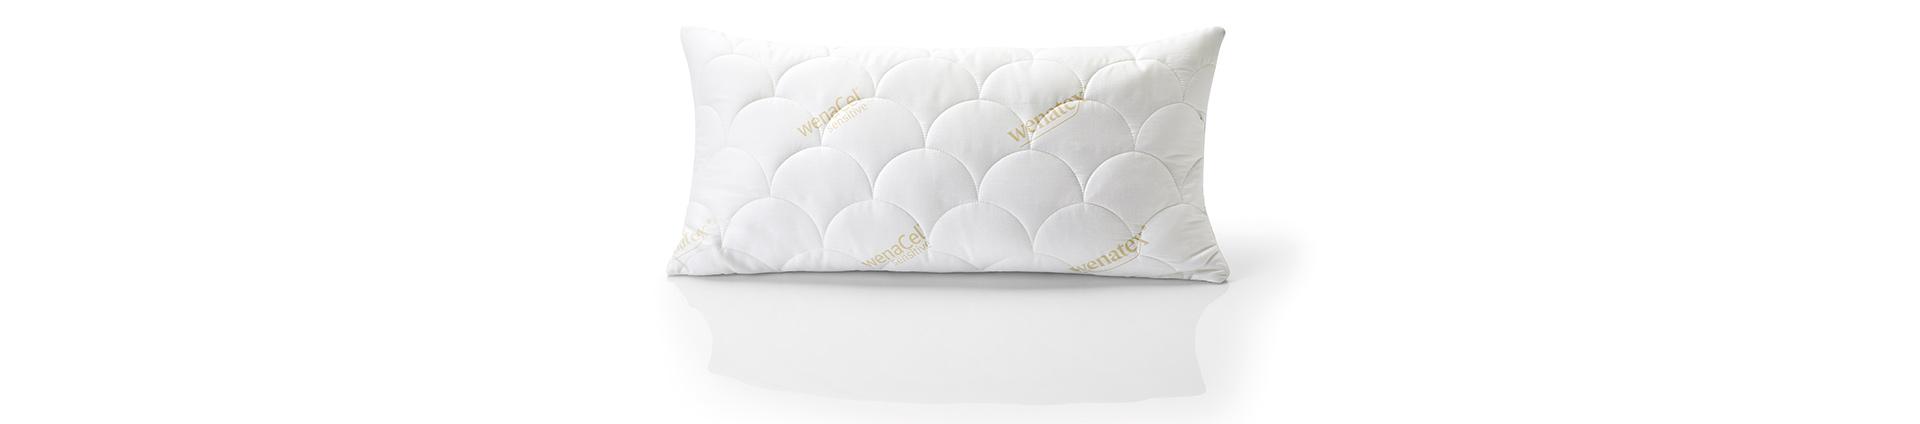 Cuscini Wenatex.The Wenacel Sensitive Pillow From Wenatex Comfortable Support